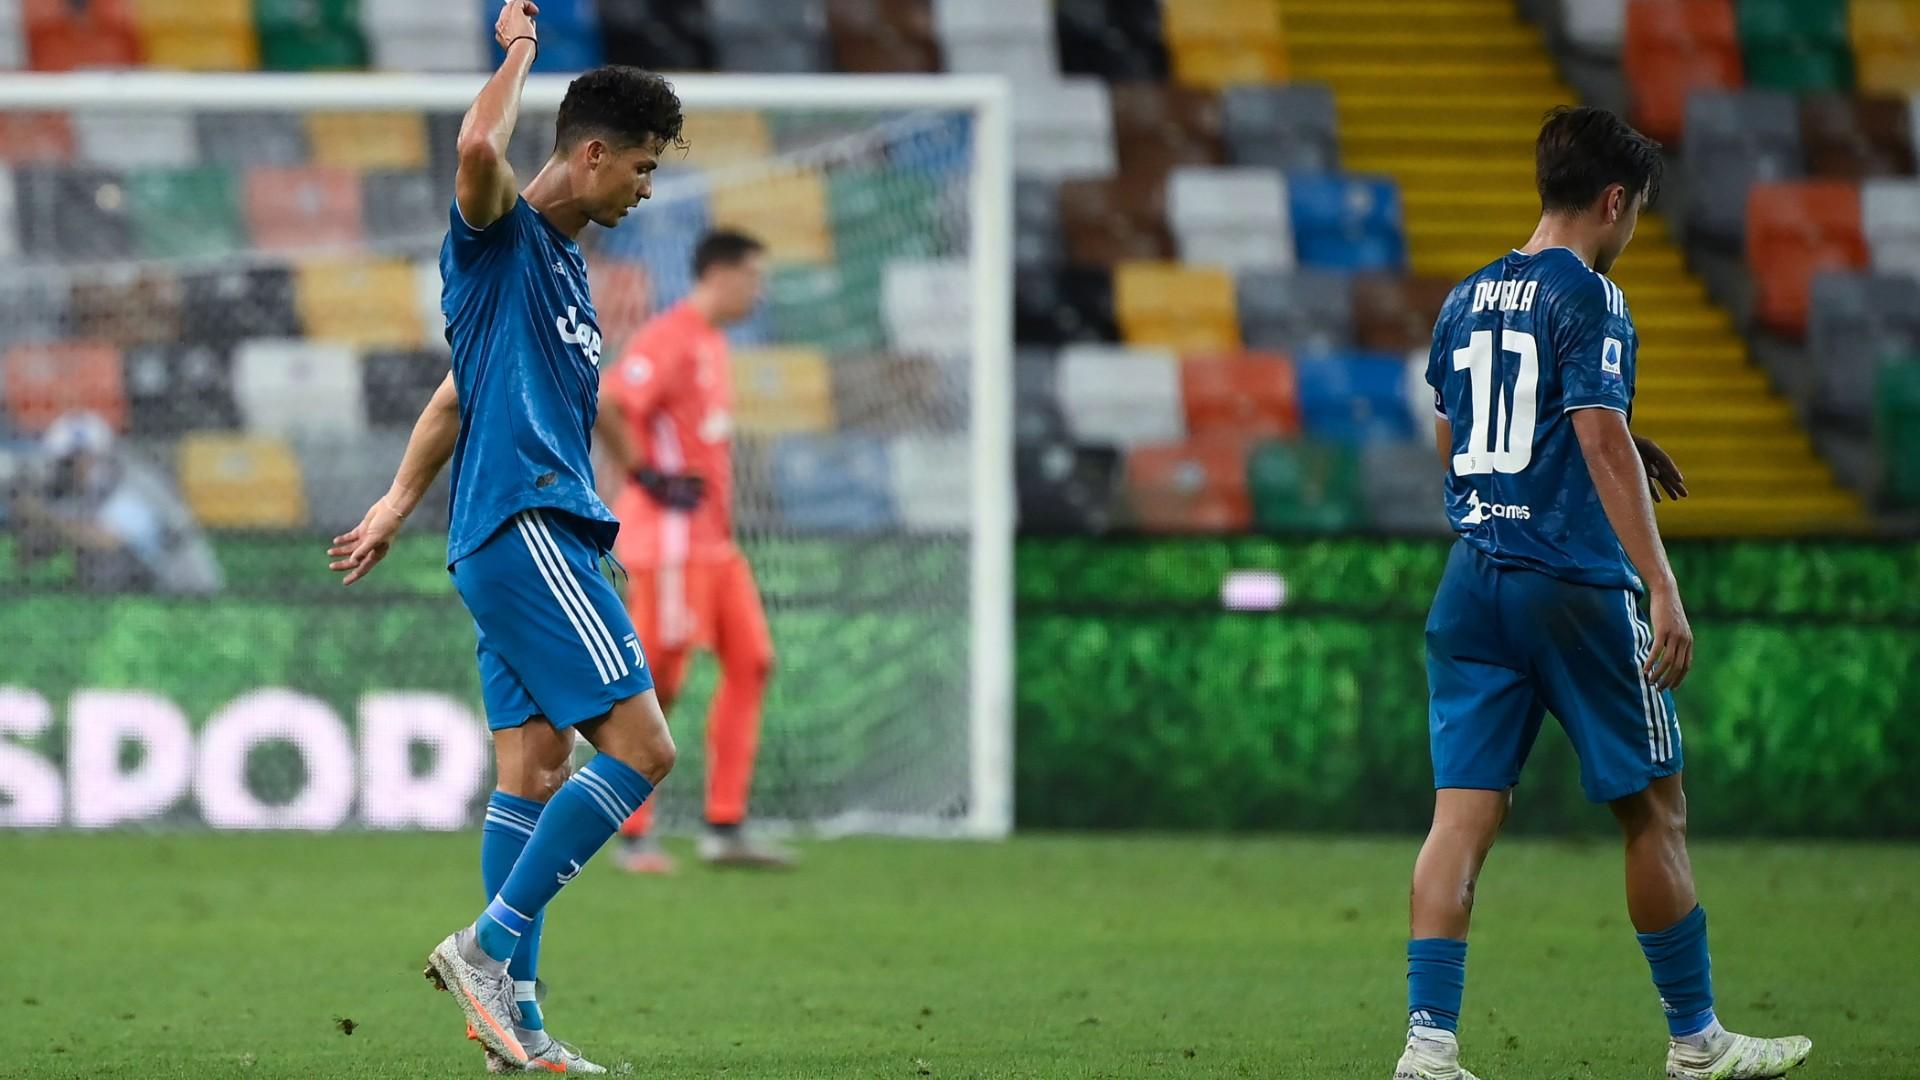 Udinese-Juventus 2-1 - Le foto di Udinese-Juventus 2-1 | Virgilio ...